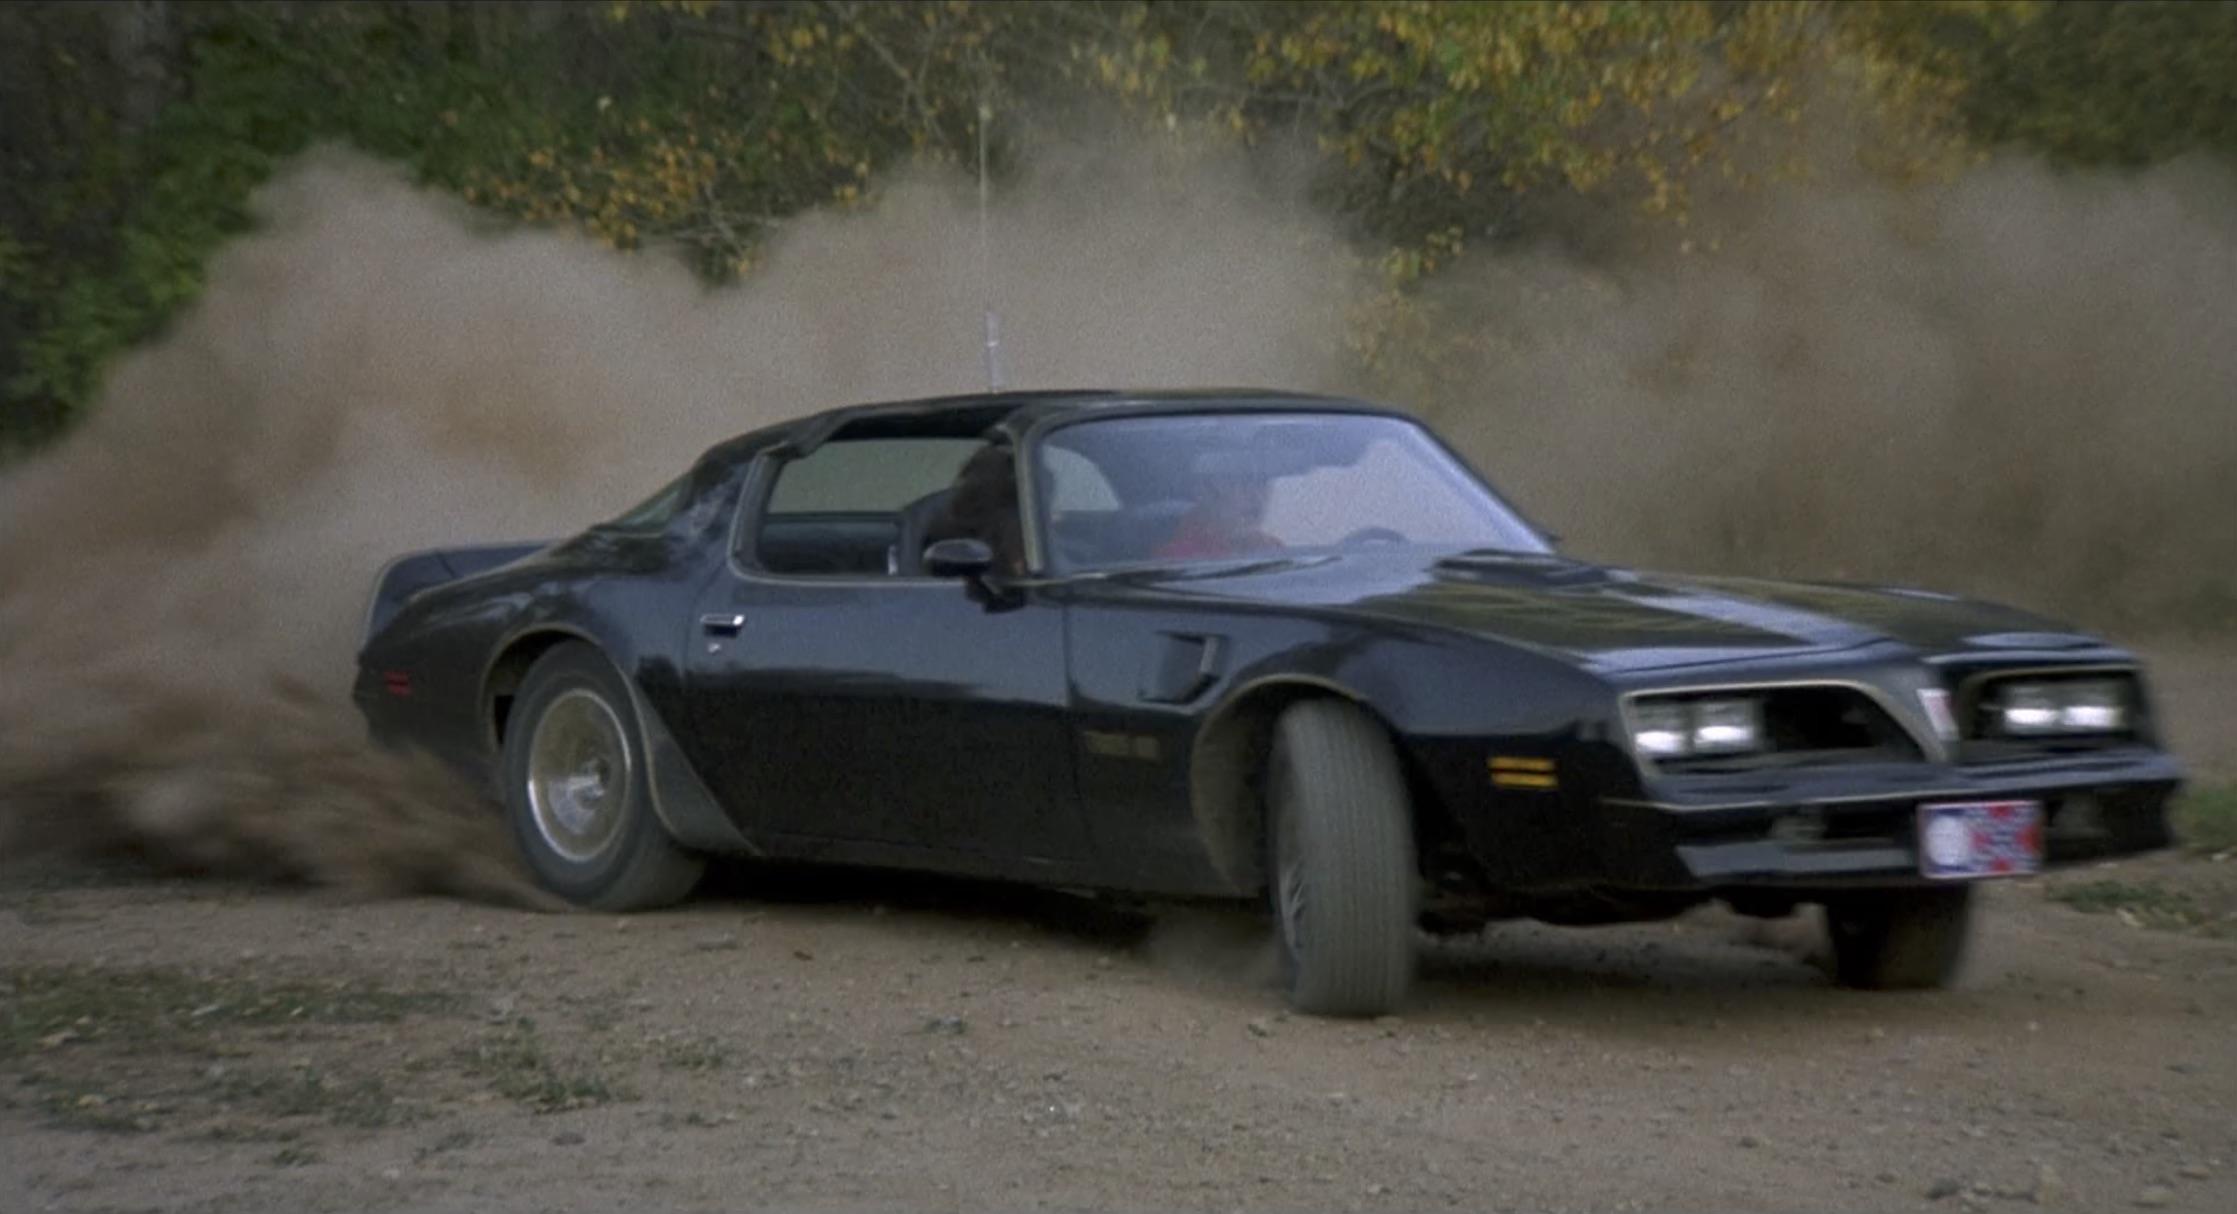 Smokey and the bandit dirt burnout